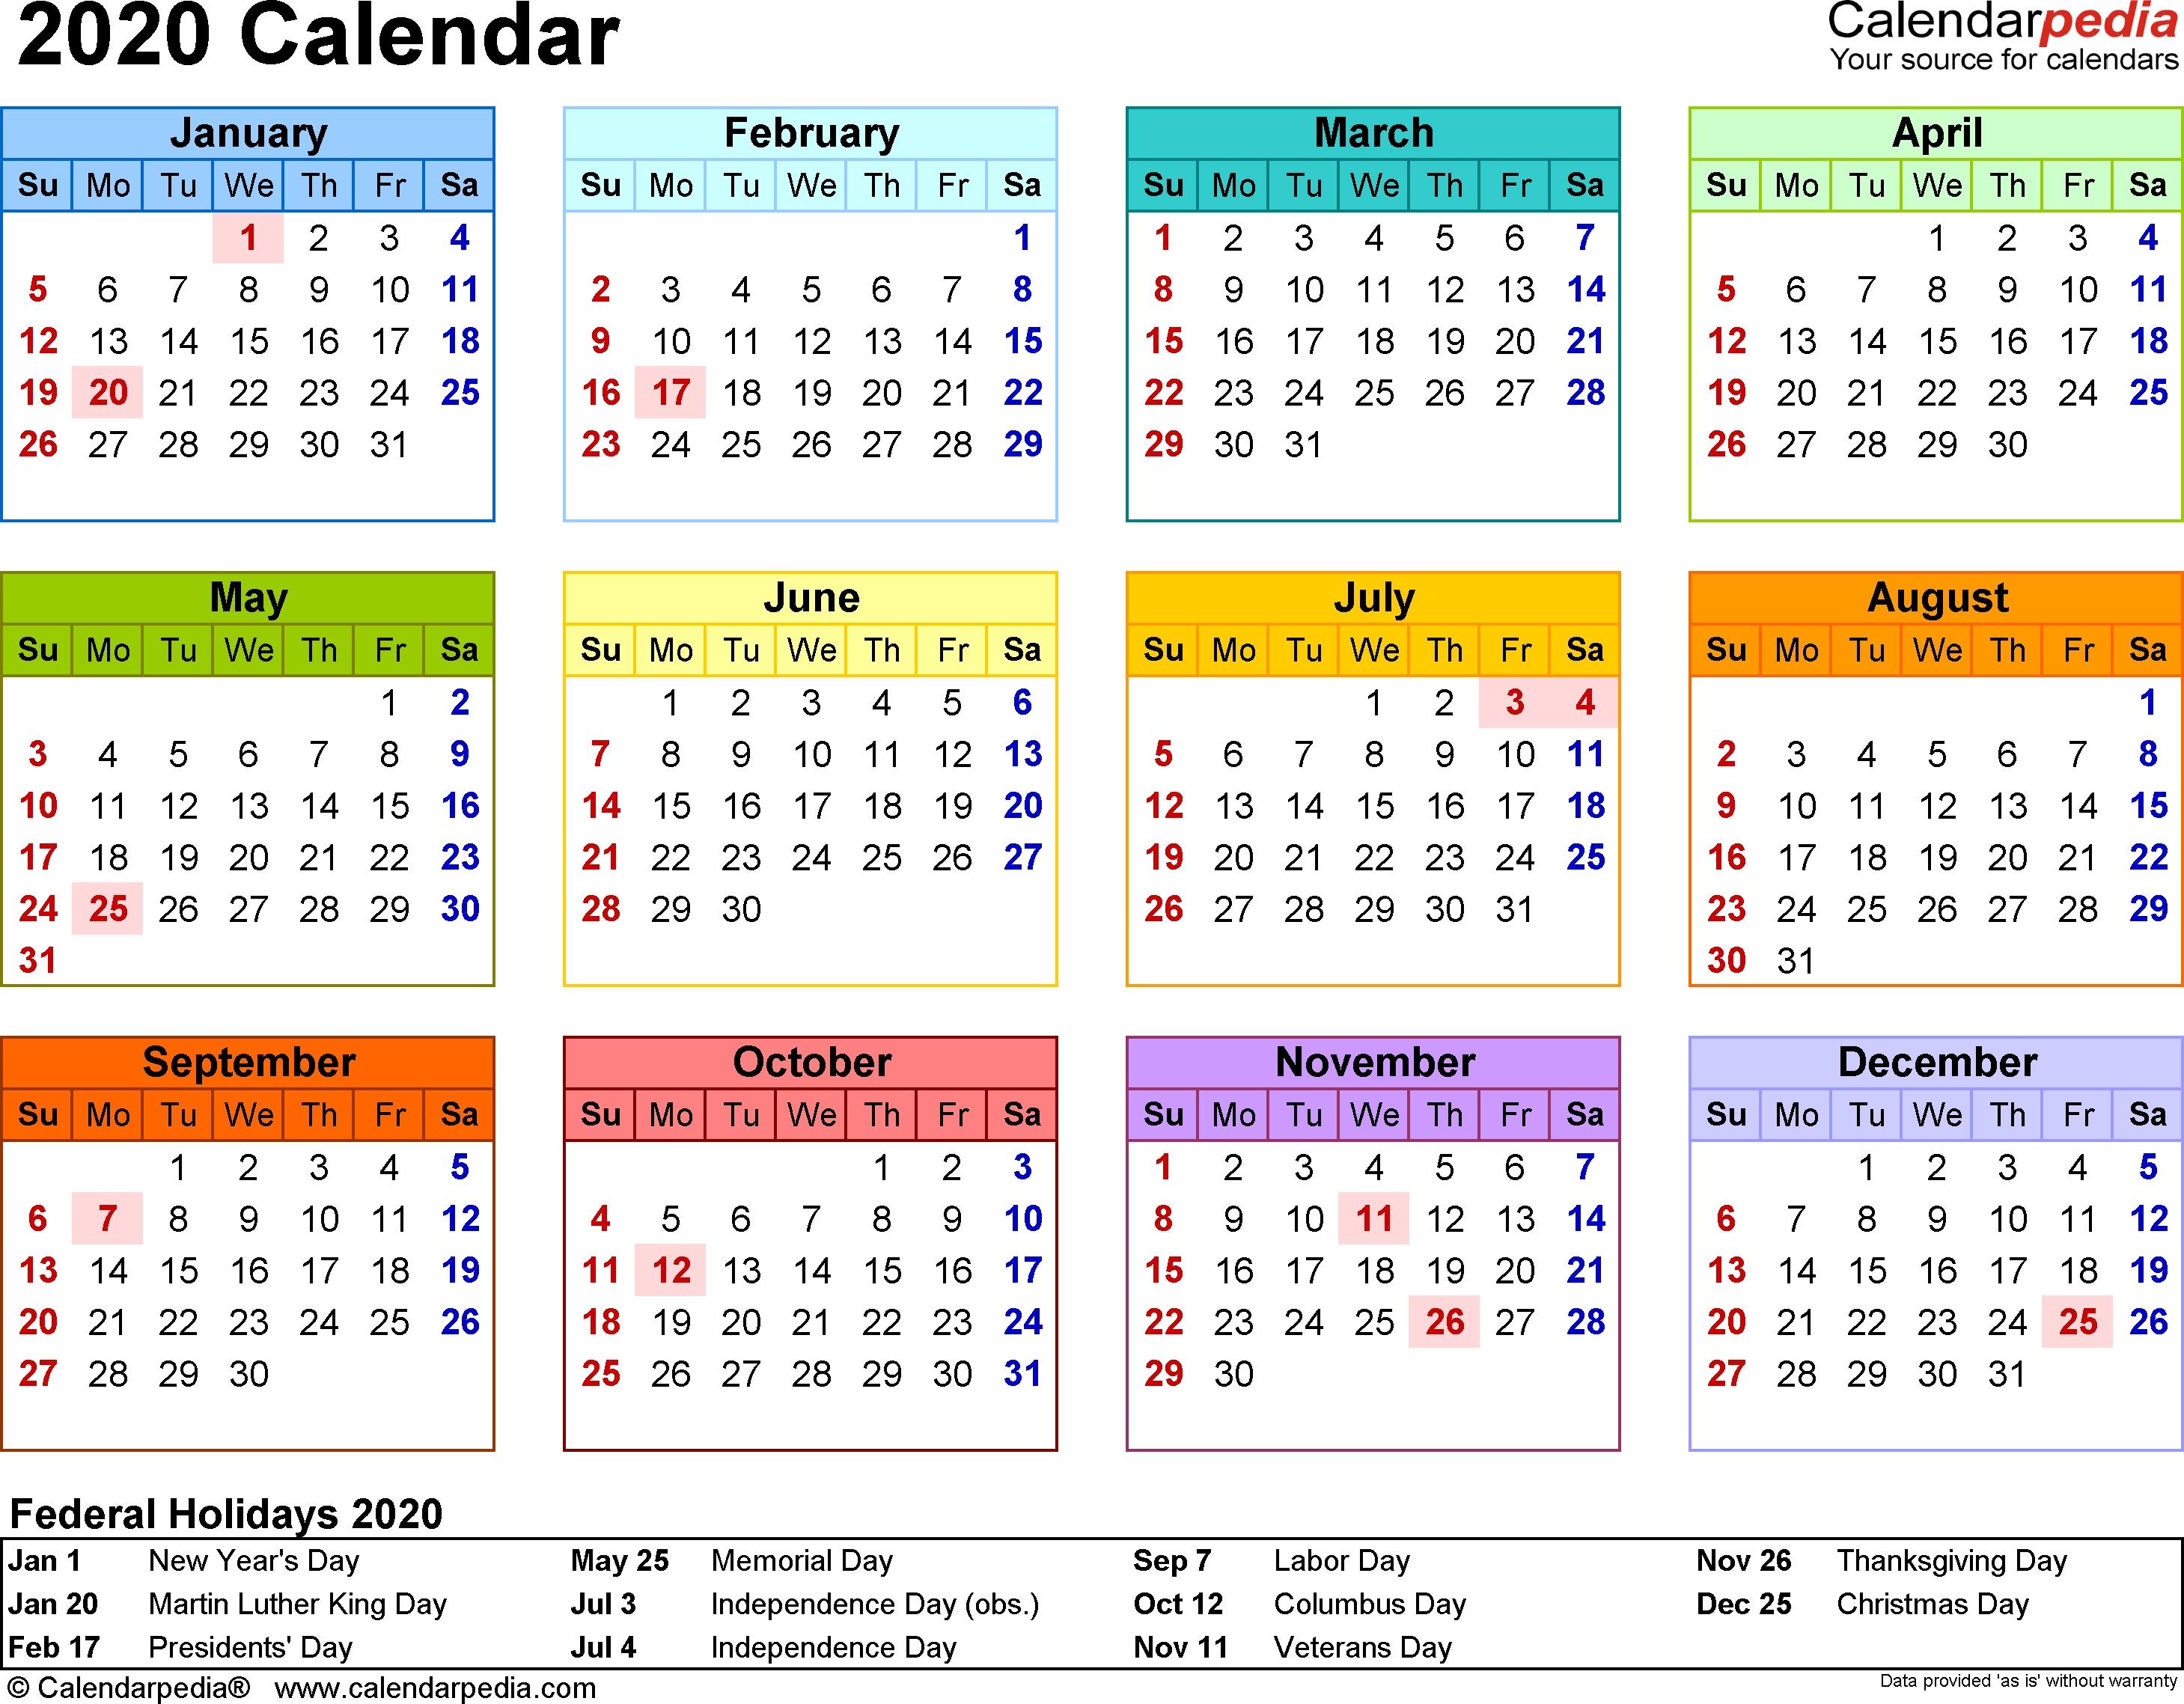 2020 Calendar - Download 18 Free Printable Excel Templates-Employee Vacation Calendar Template 2020 Printable Free